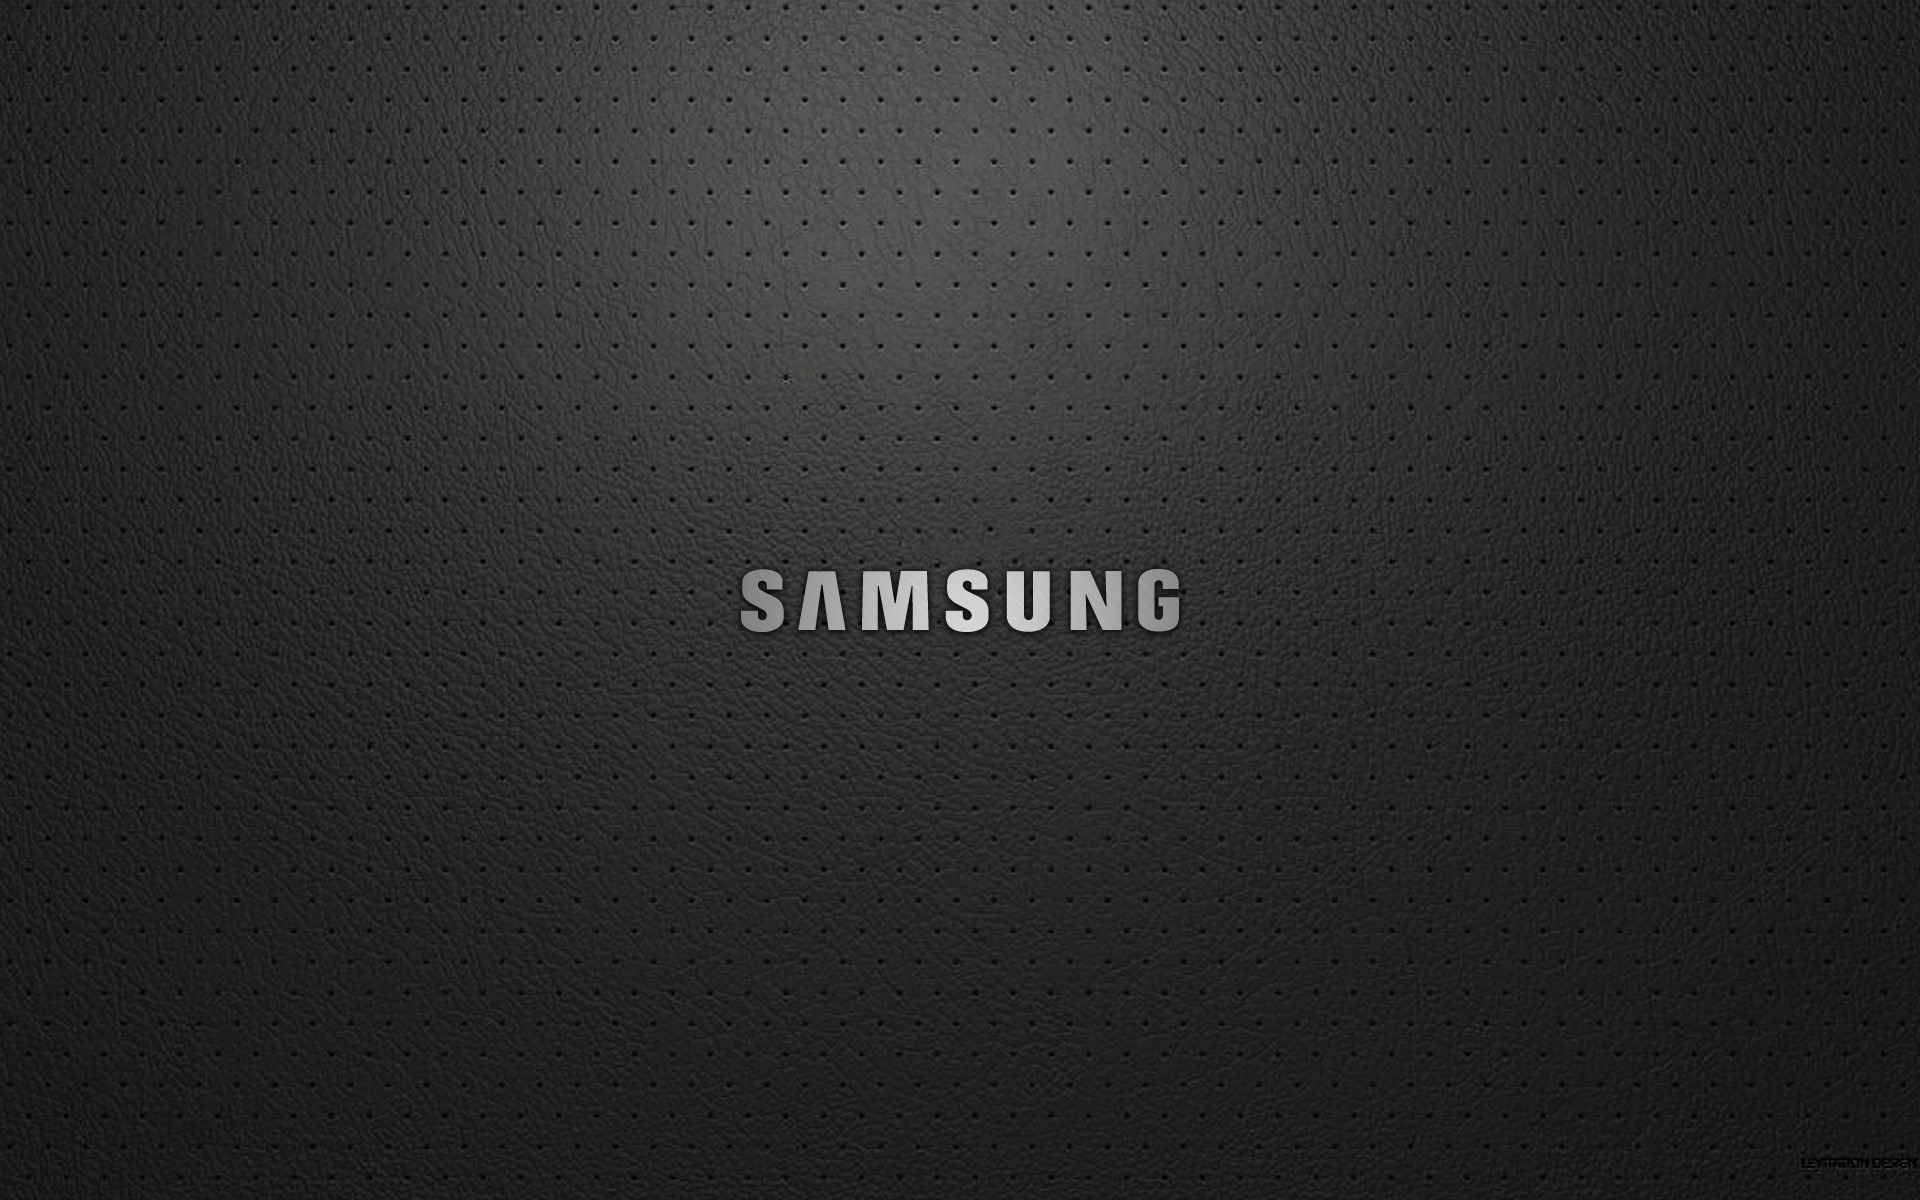 Samsung Electronics Windows 81 Theme All for Windows 10 1920x1200